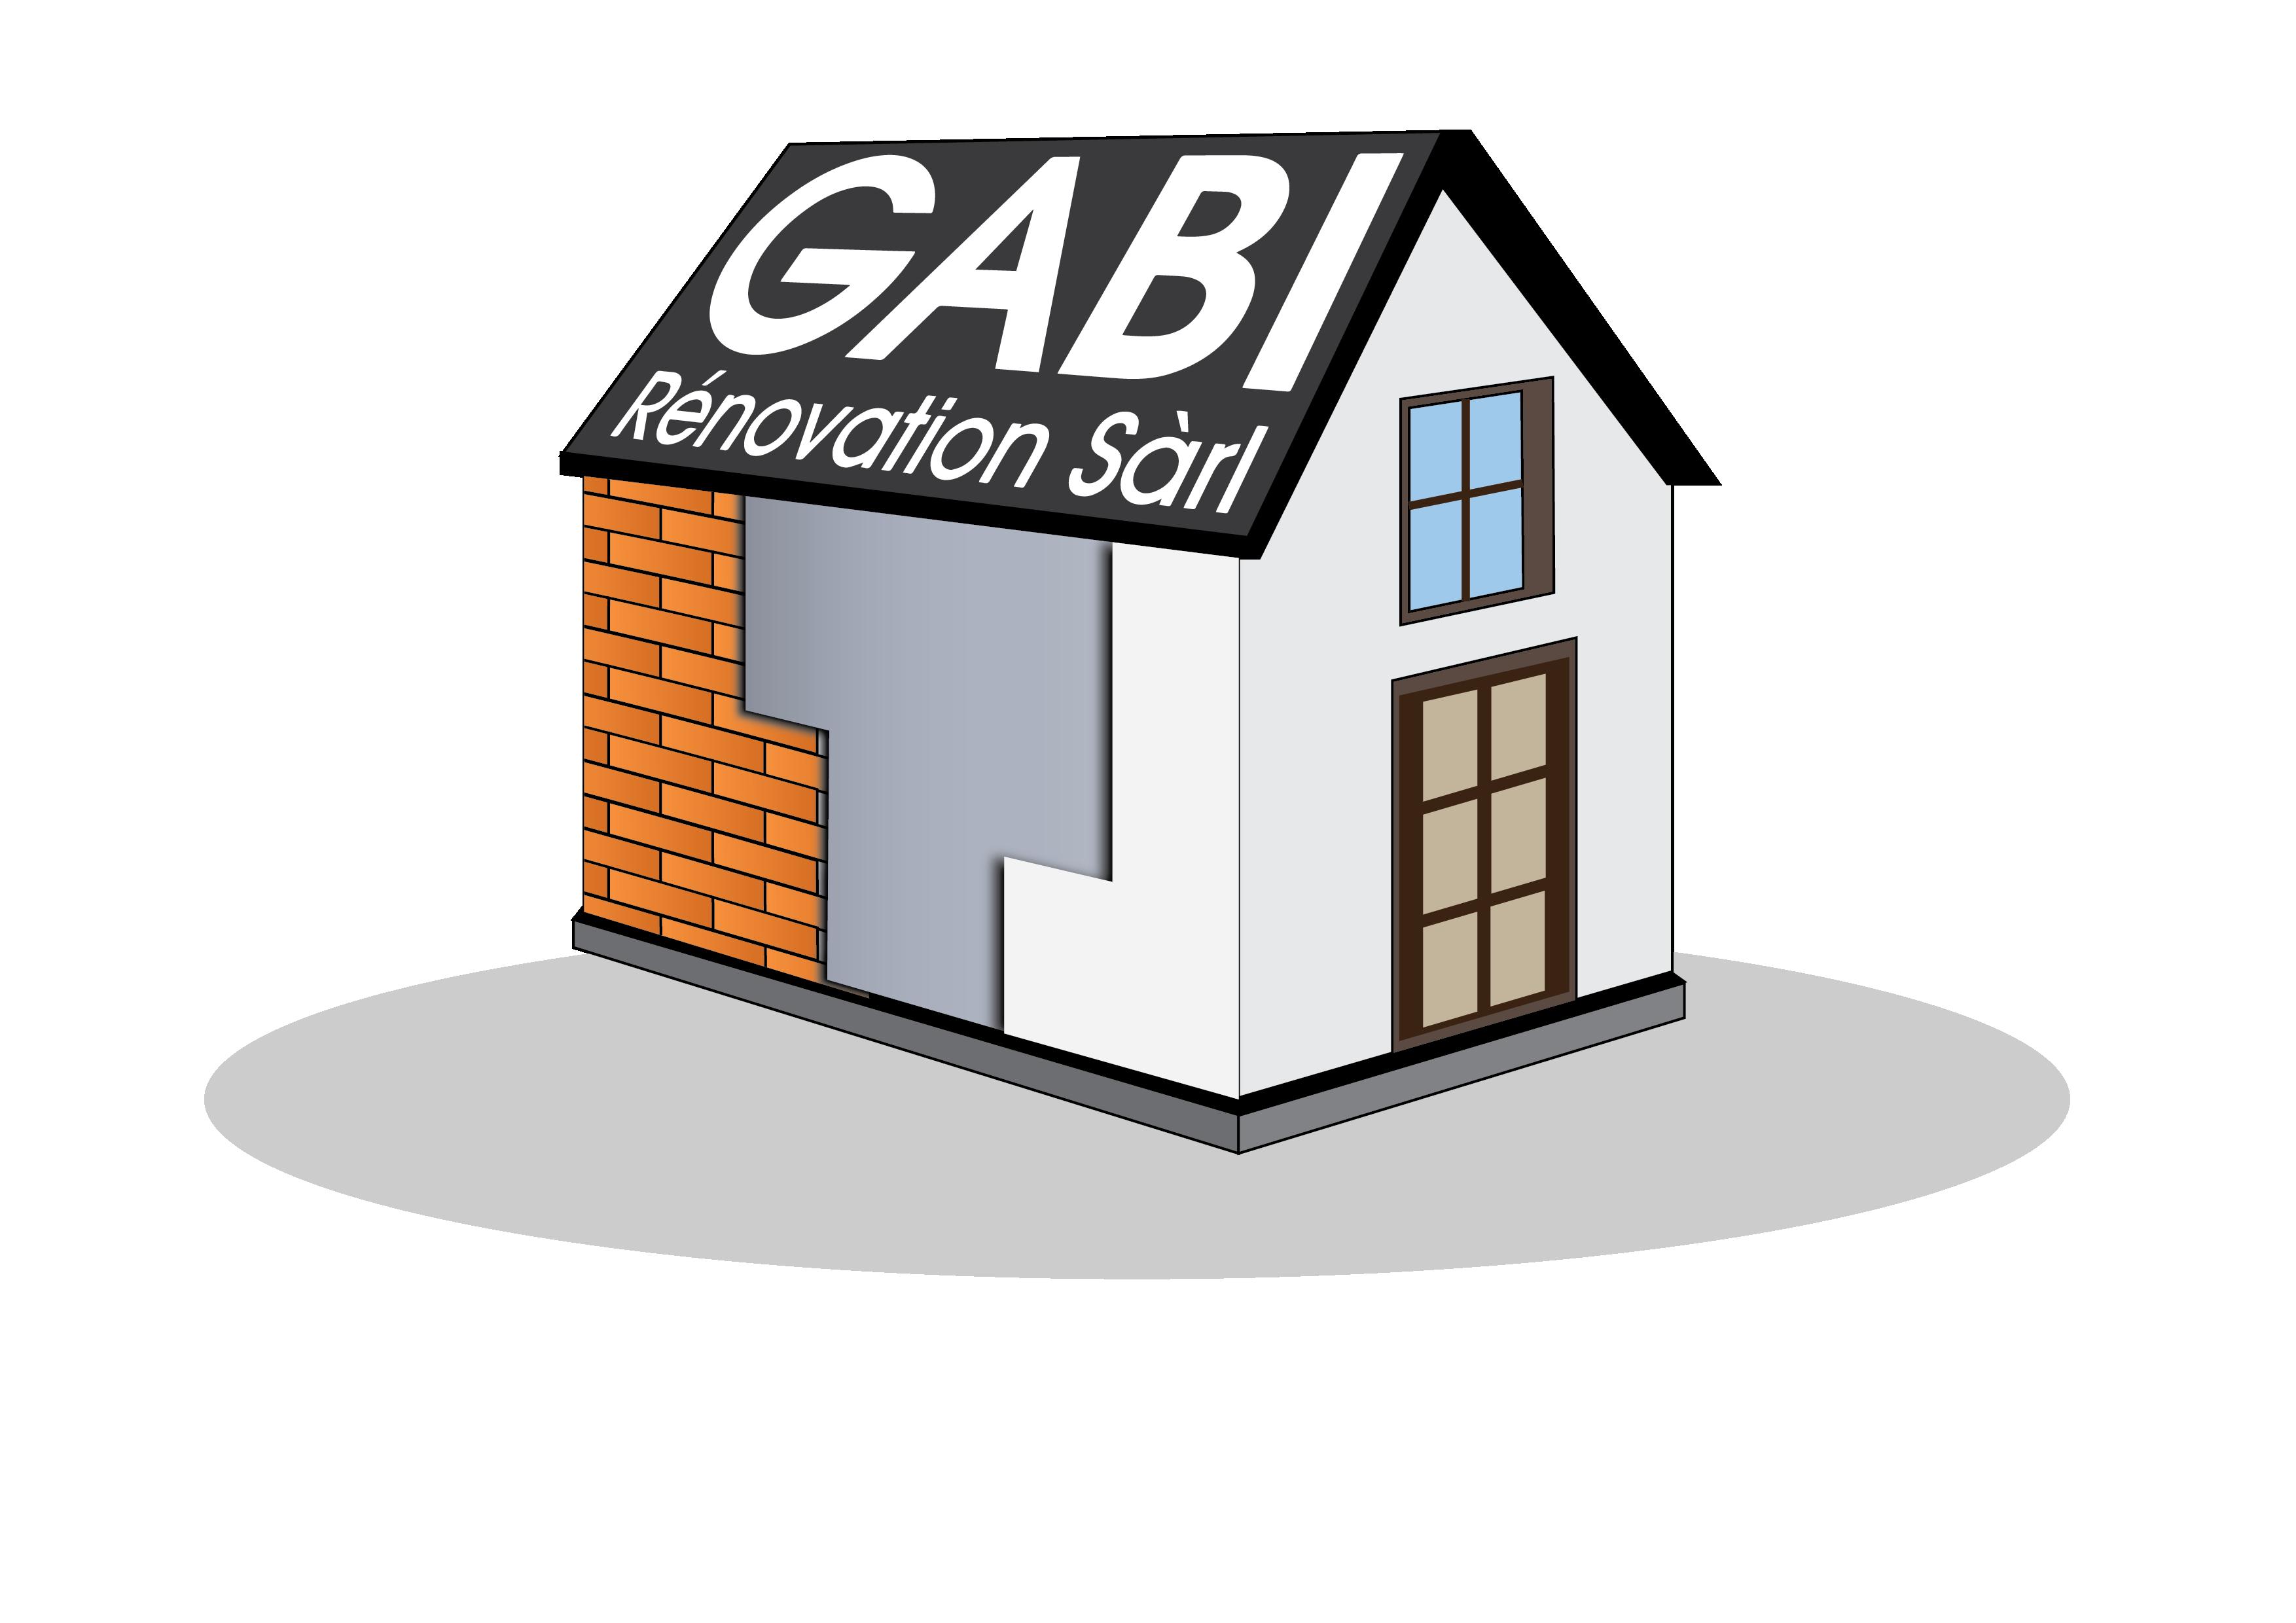 Gabi Rénovation Sàrl